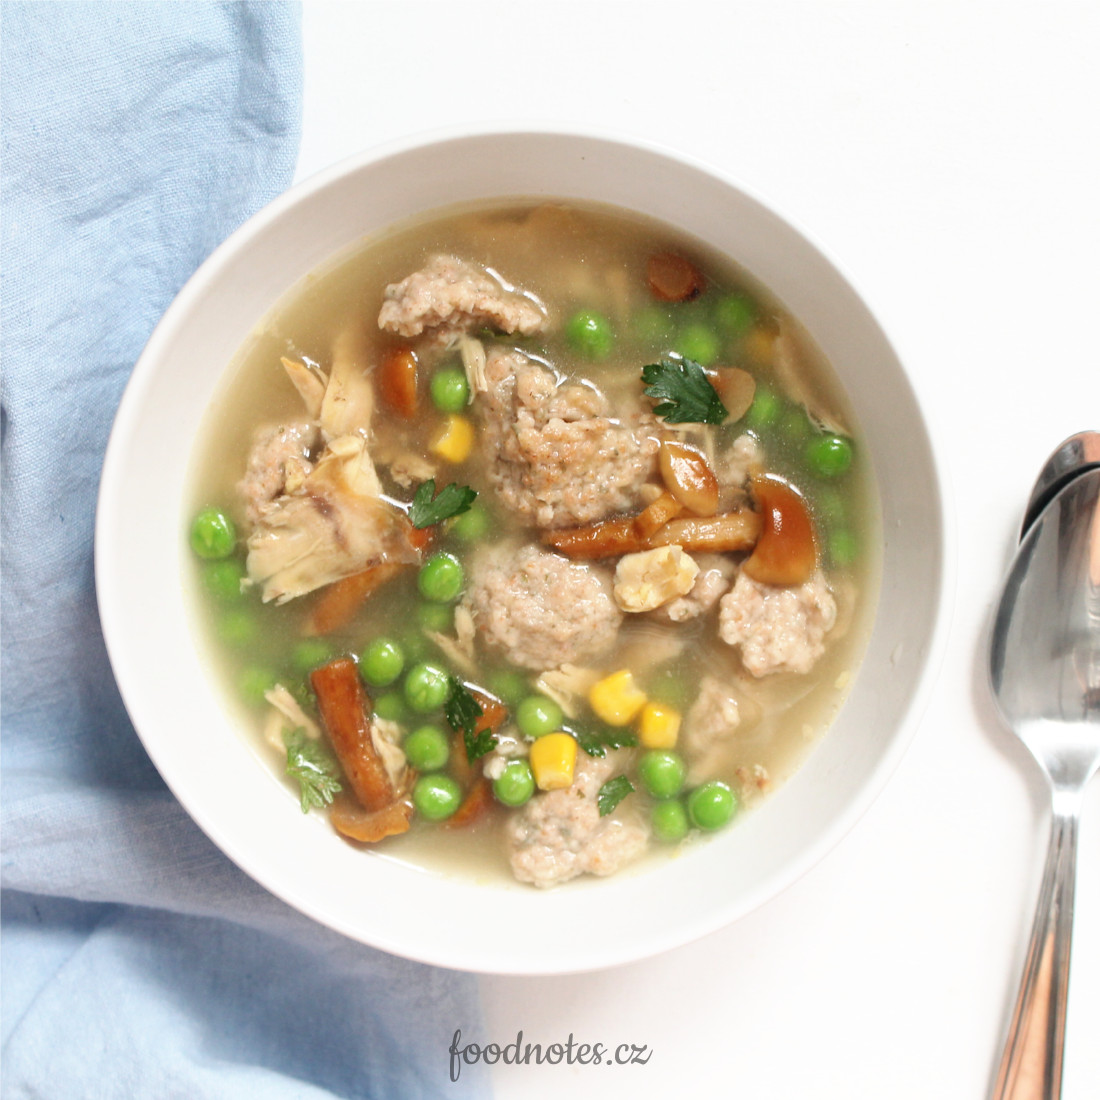 Recept na jednoduché nočky do polévky